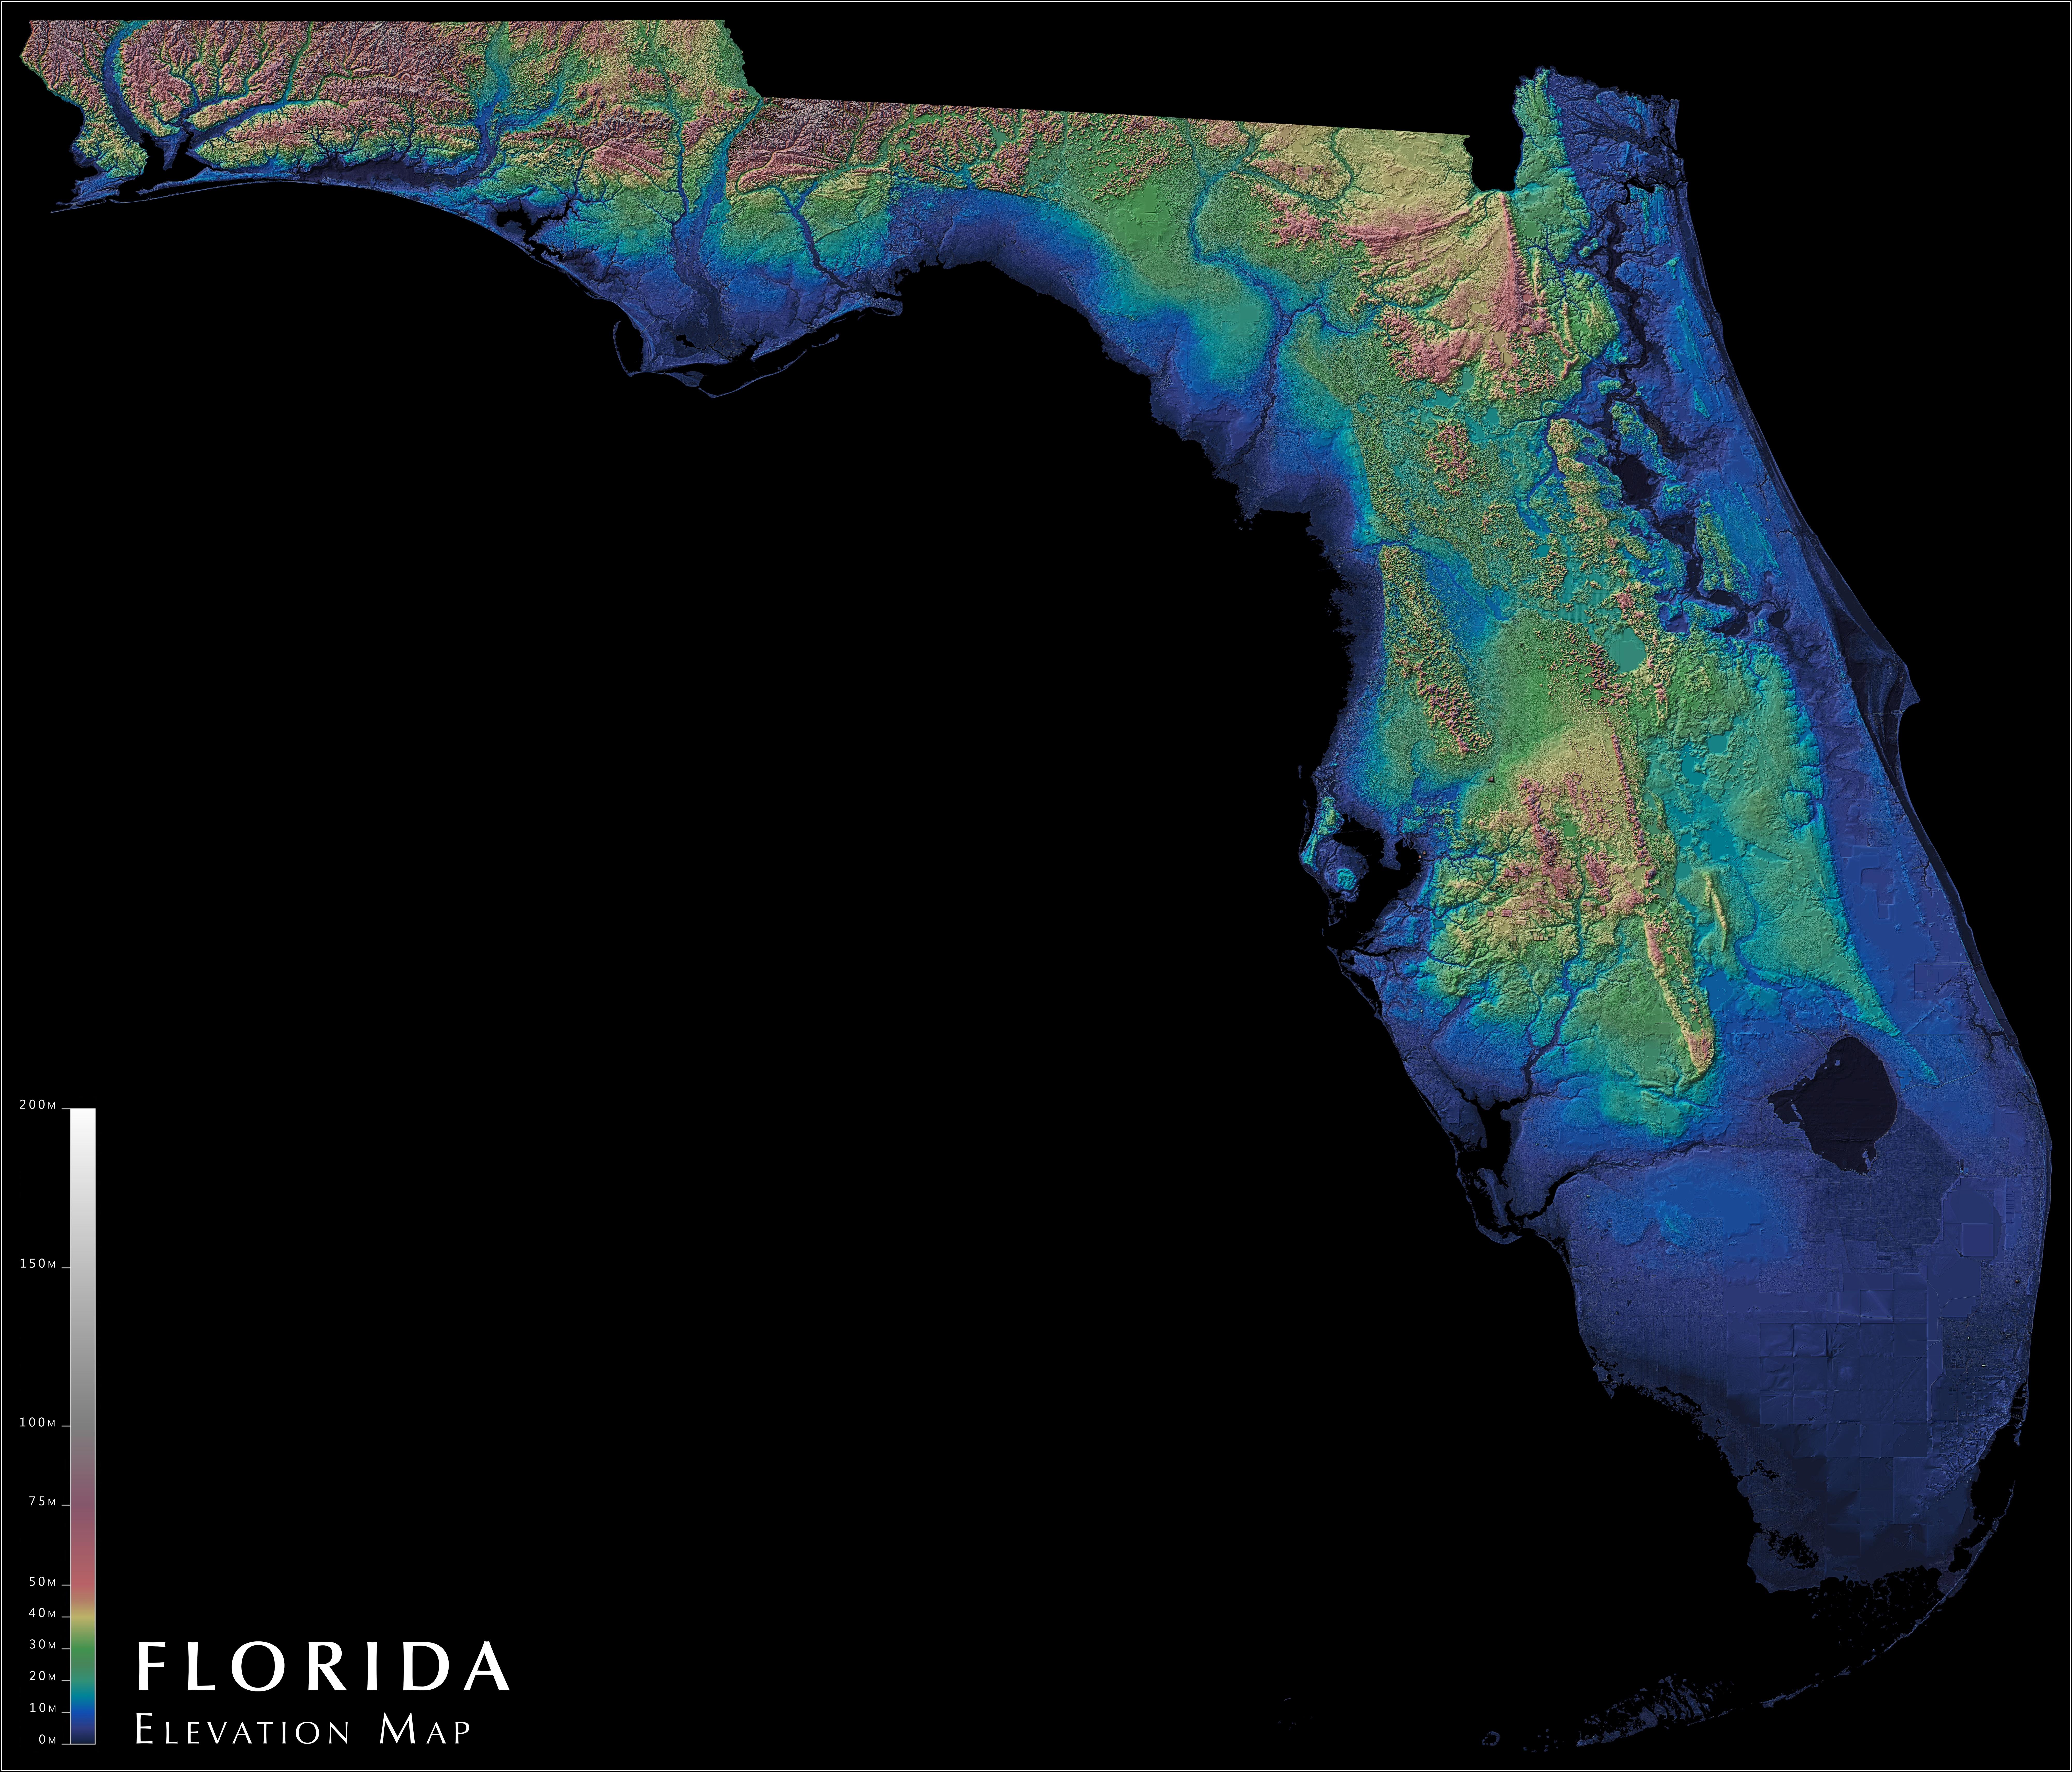 Florida Elevation Map : Florida - Florida Underwater Map